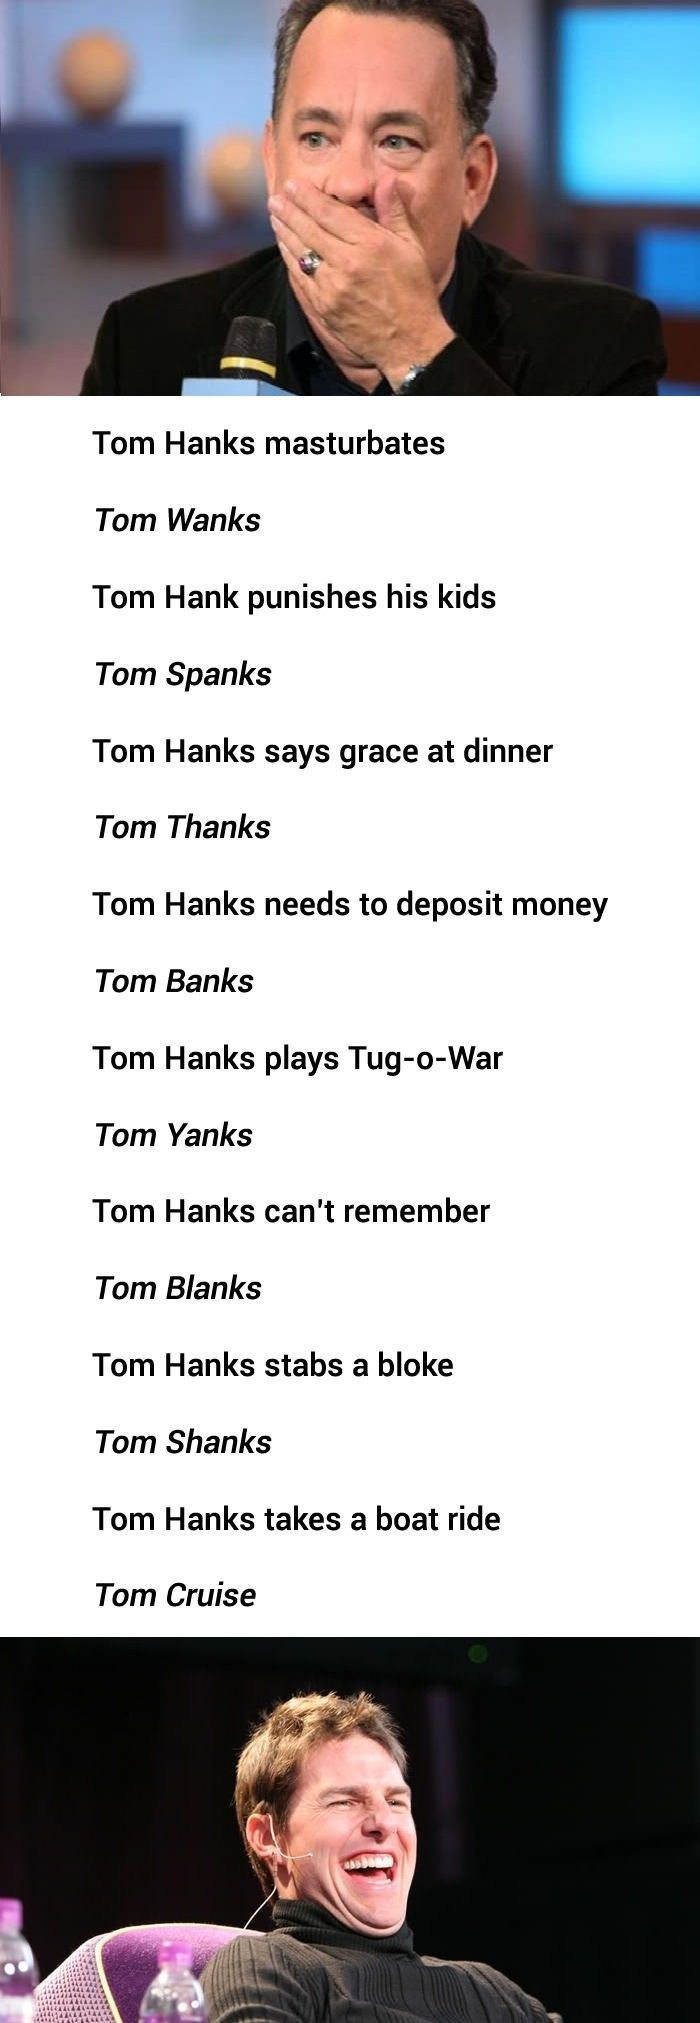 Tom Hanks celebrates Halloween, David S. Pumpkins